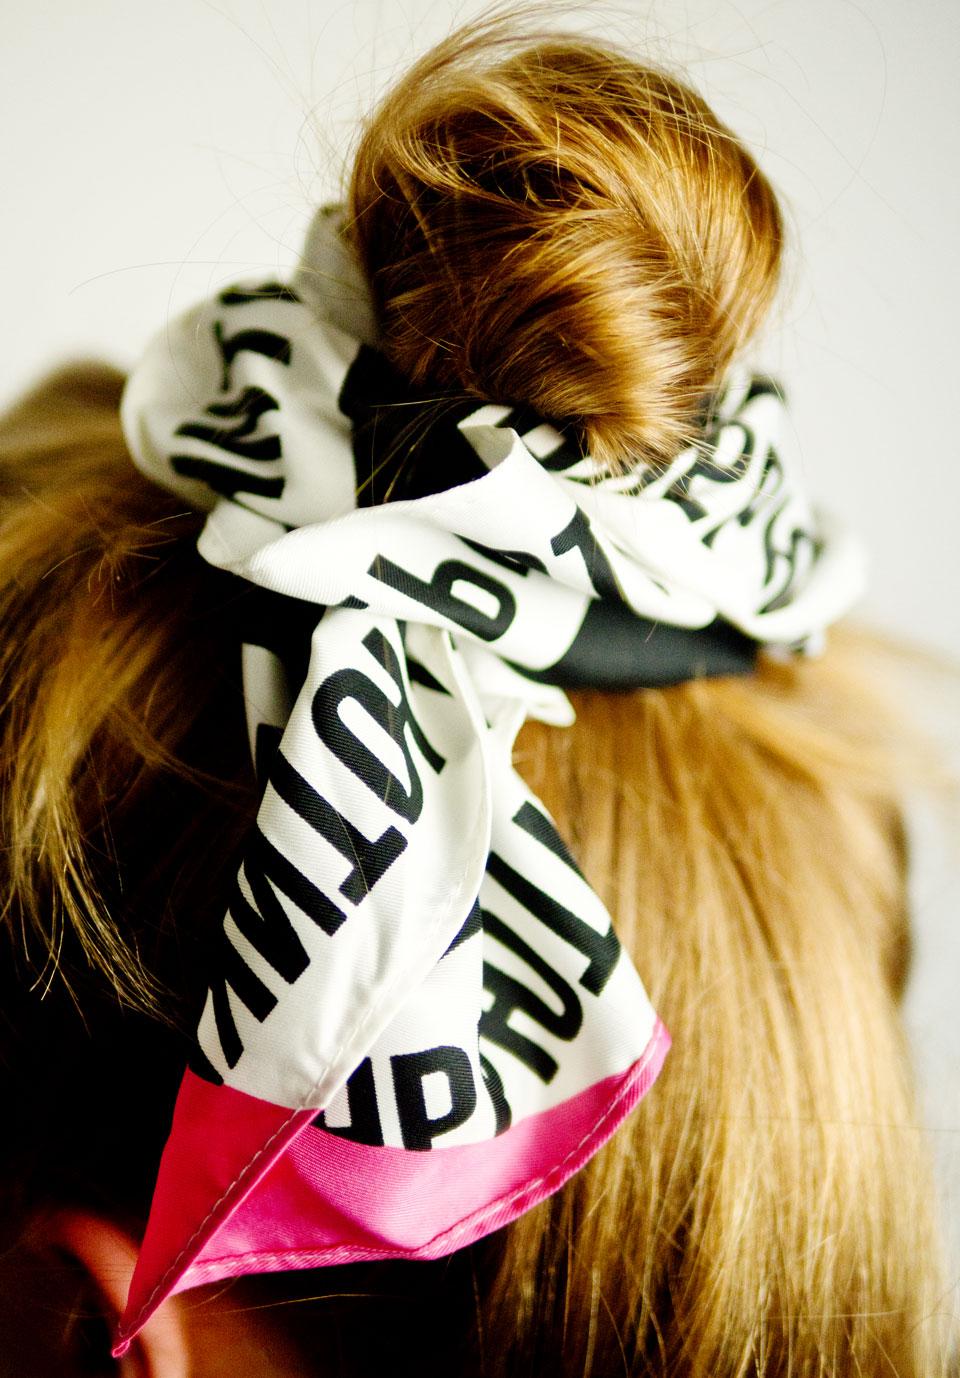 Bows von PUFFIN, PUFFIN Beauty, Haar Accessoires, Haar Styling, trendige Frisuren mit Haar Accessoires, PUFFIN Beauty, Braid Bow, Bun Bow, Haar Styling, trendige Haar Styles